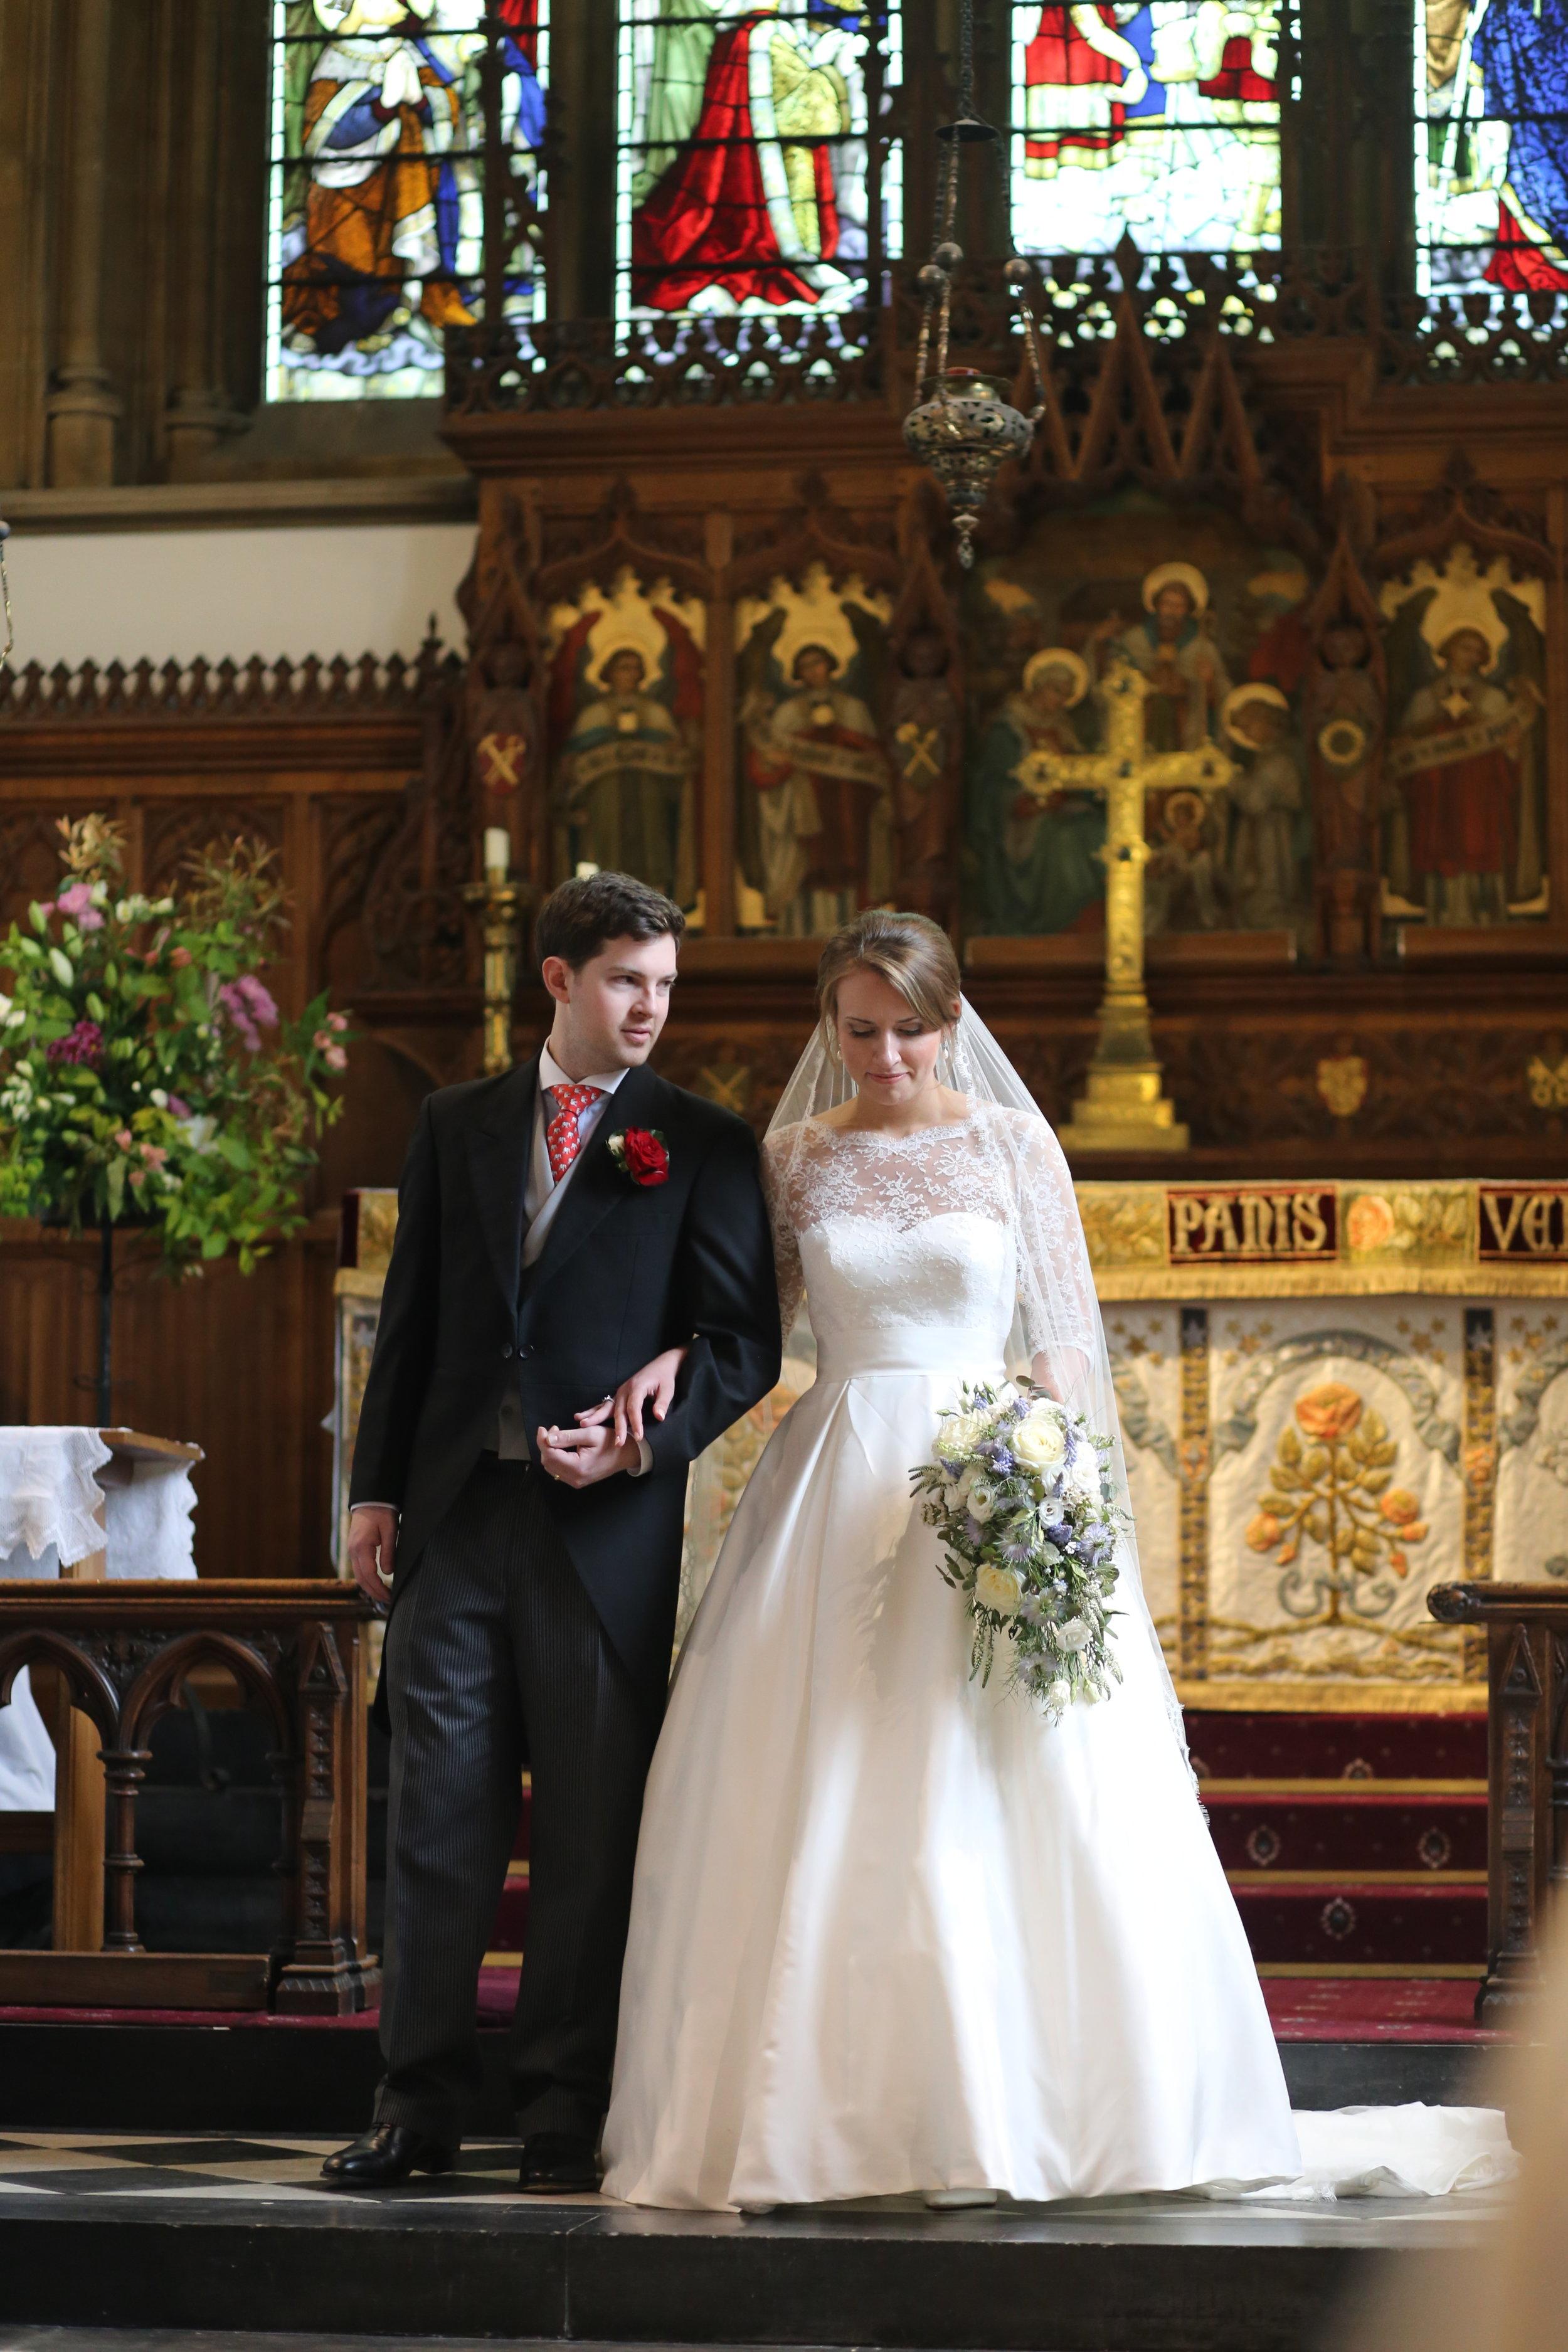 MIRIAM_FAITH_WEDDING_FLOWERS_CEREMONY_BRIDE_BOUQUET_BLUE_PASTLE_CASCADE.JPG